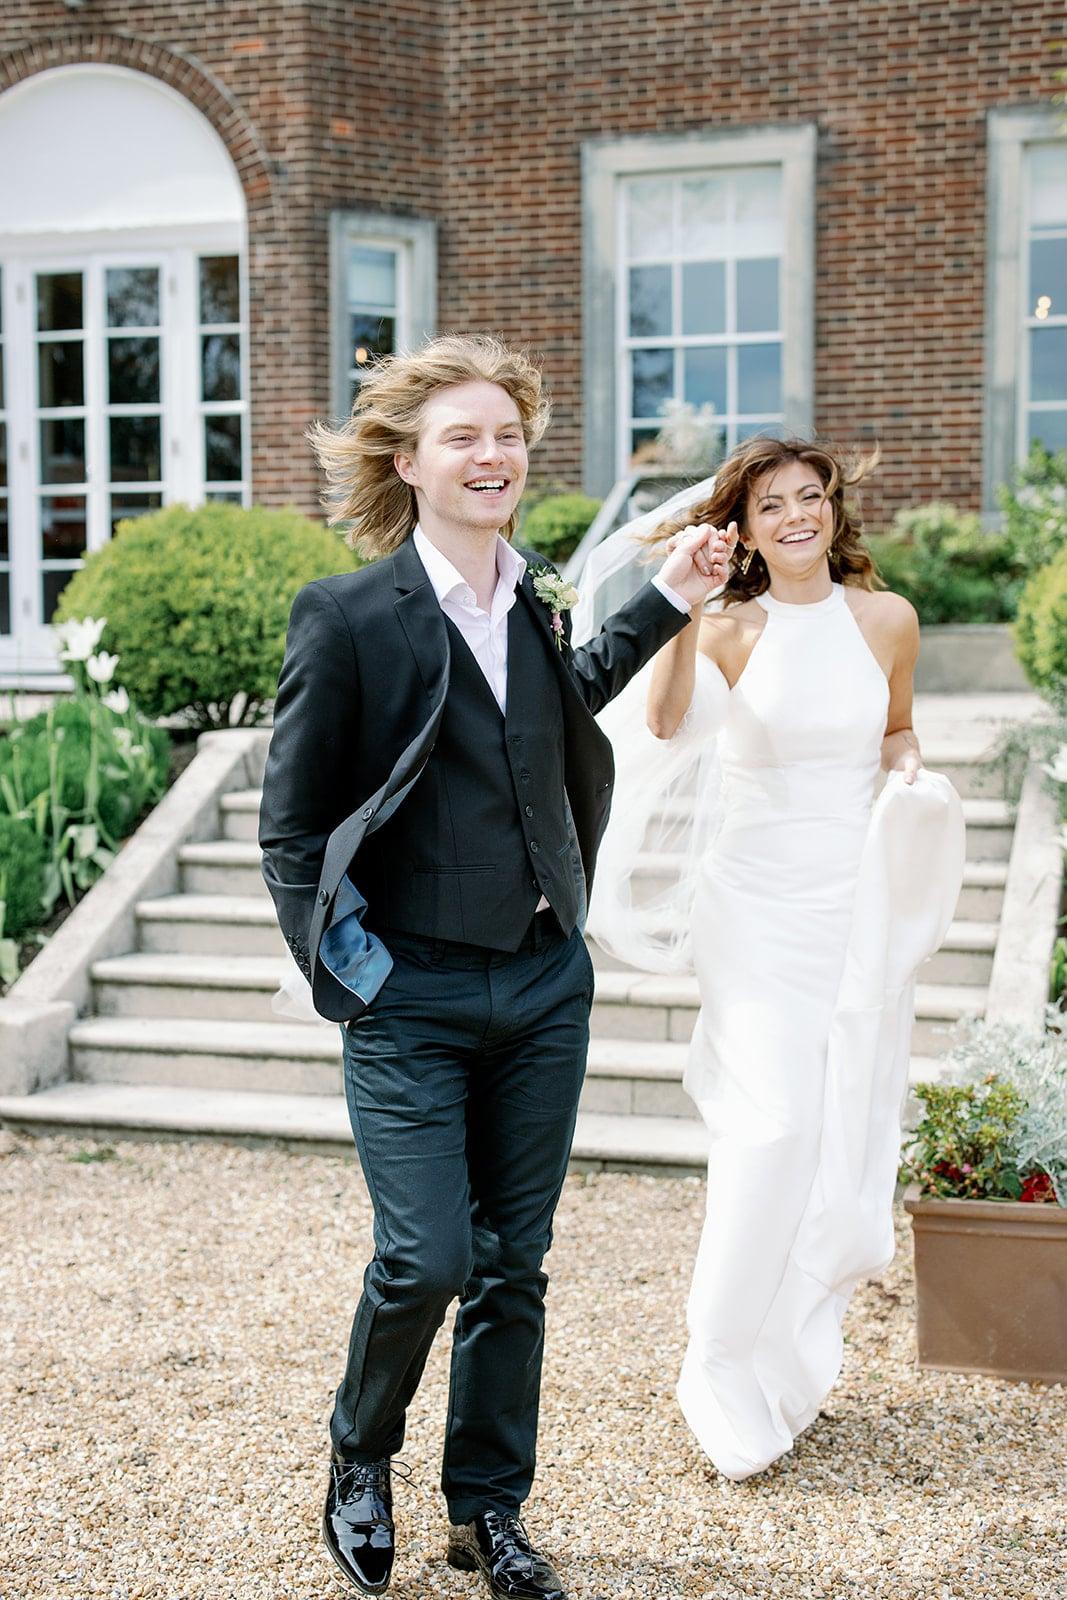 Lewes wedding photographer at Pelham House